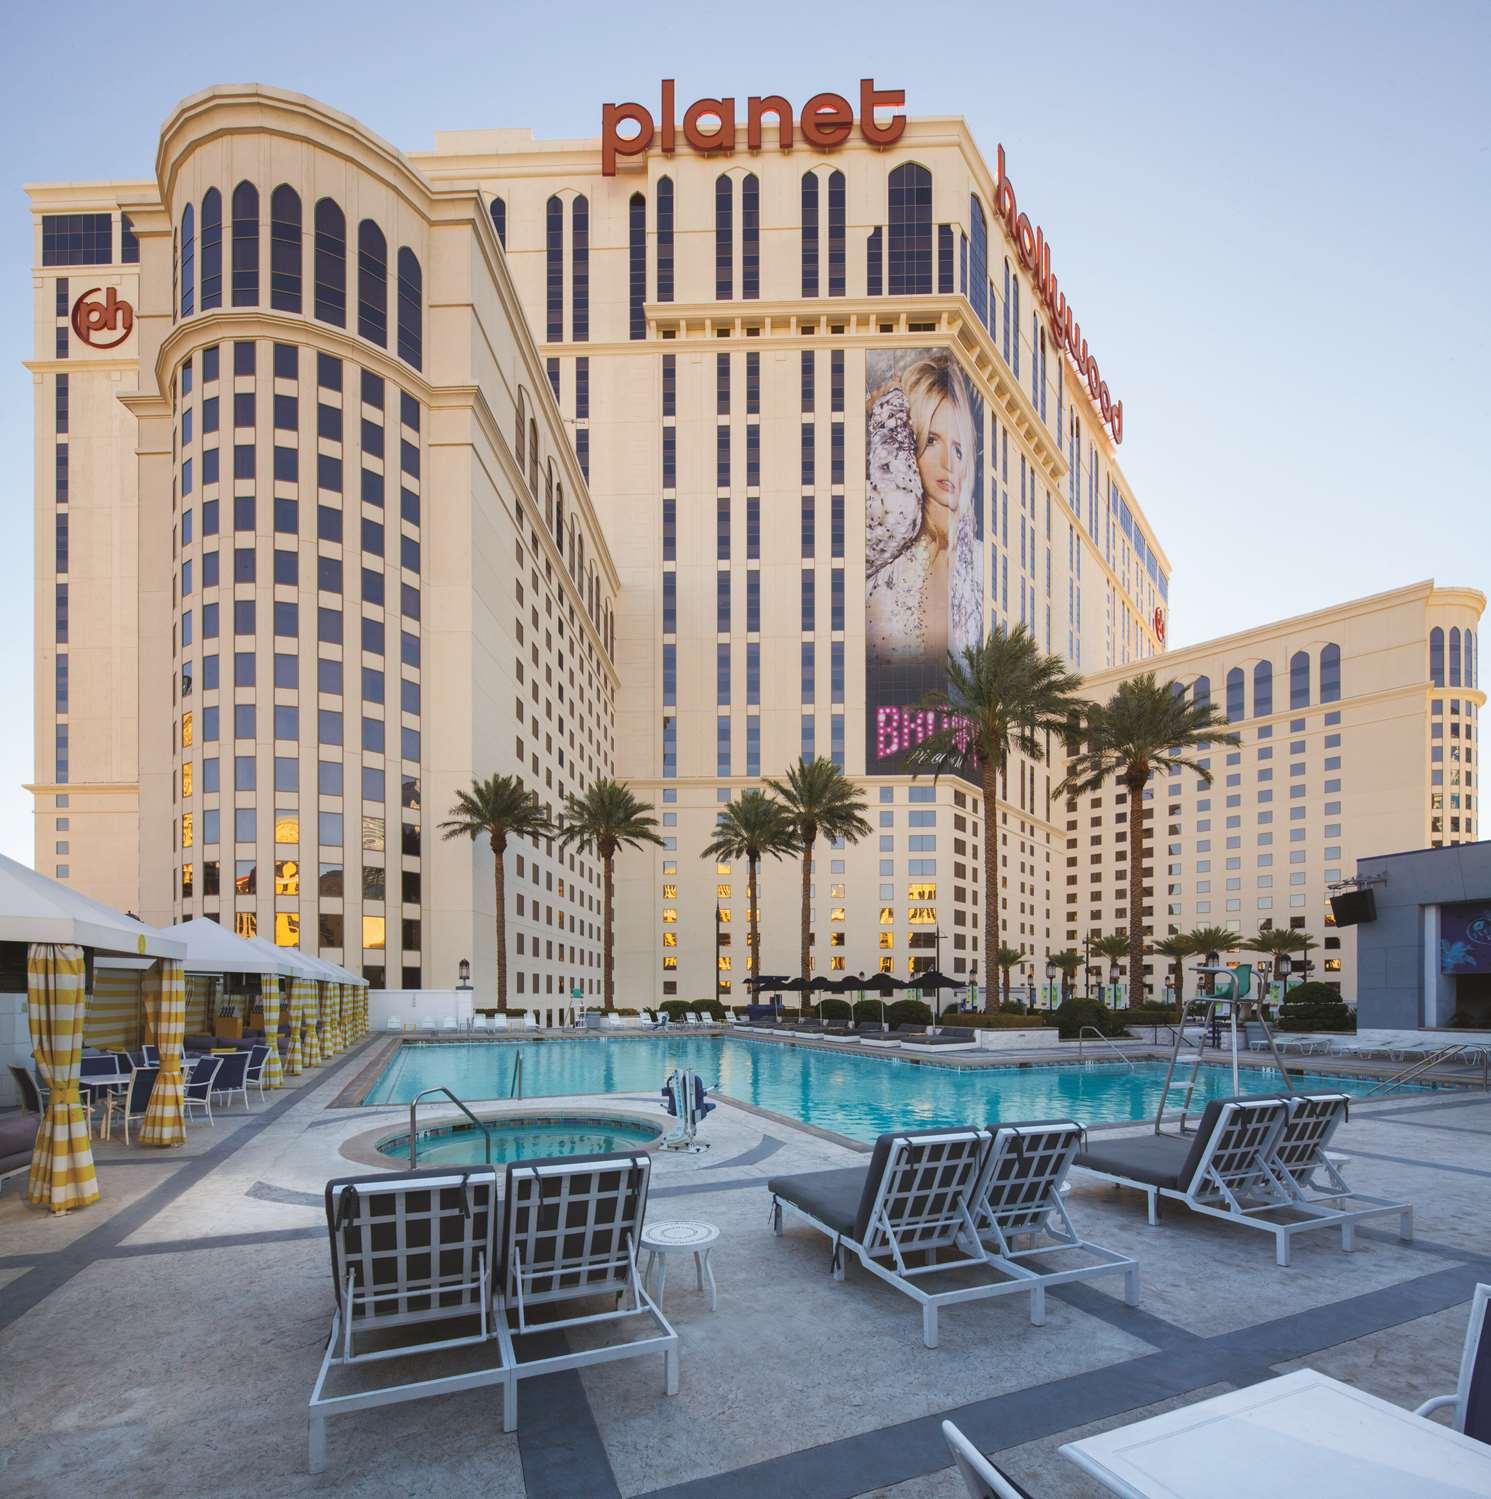 Planet Hollywood Resort & Casino, Book Hotel - AAA